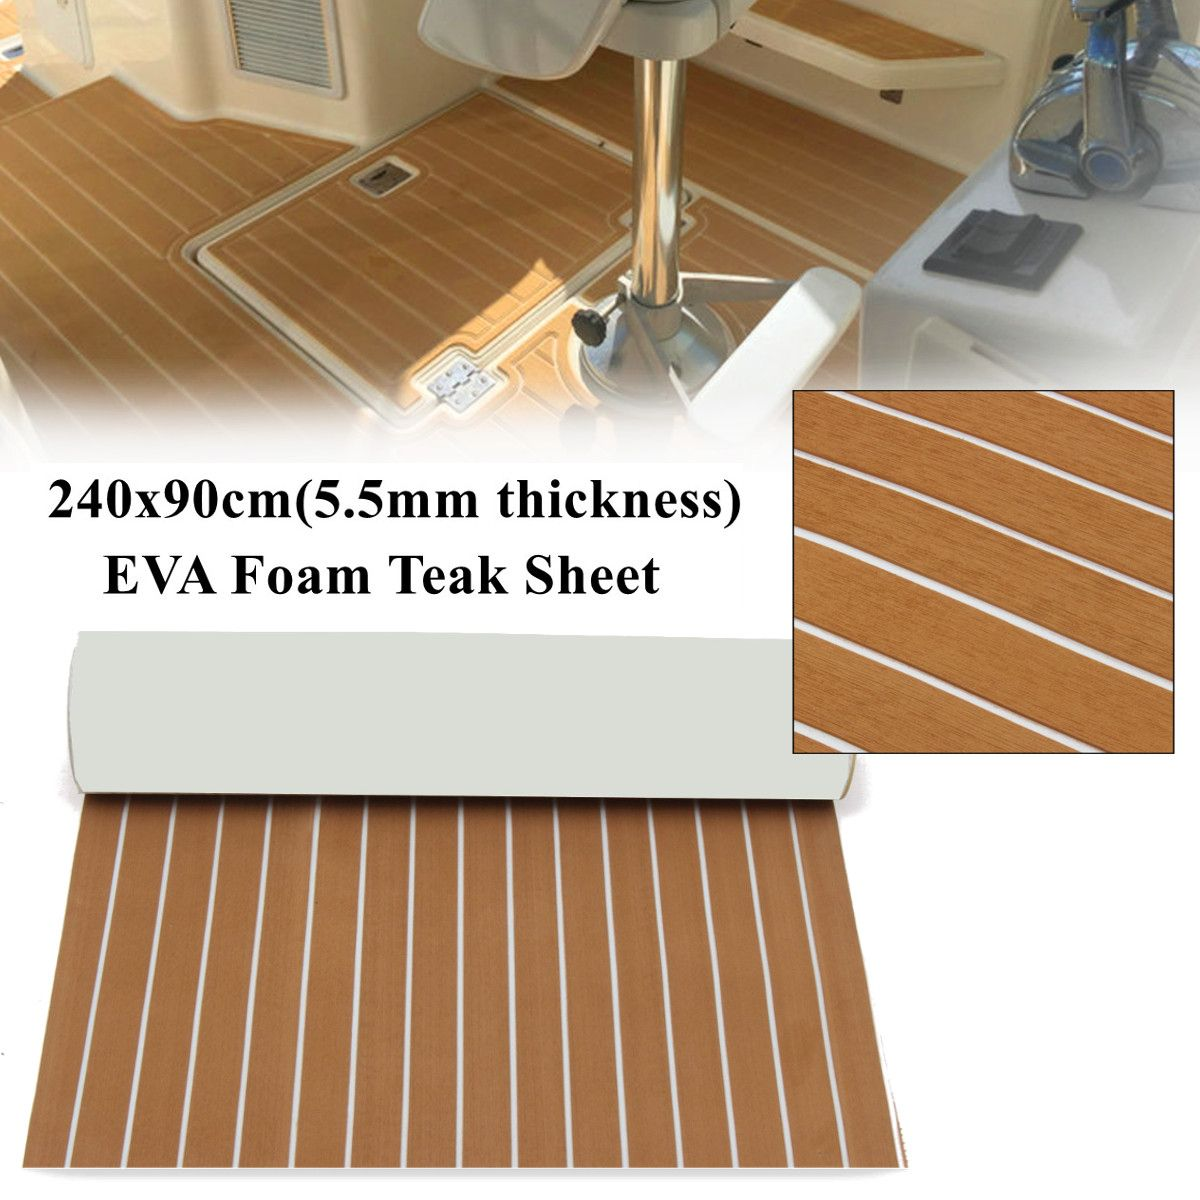 90x240cm Light Brown with White EVA Foam Teak Boat Flooring Sheet Yacht Synthetic Teak Decking Pad